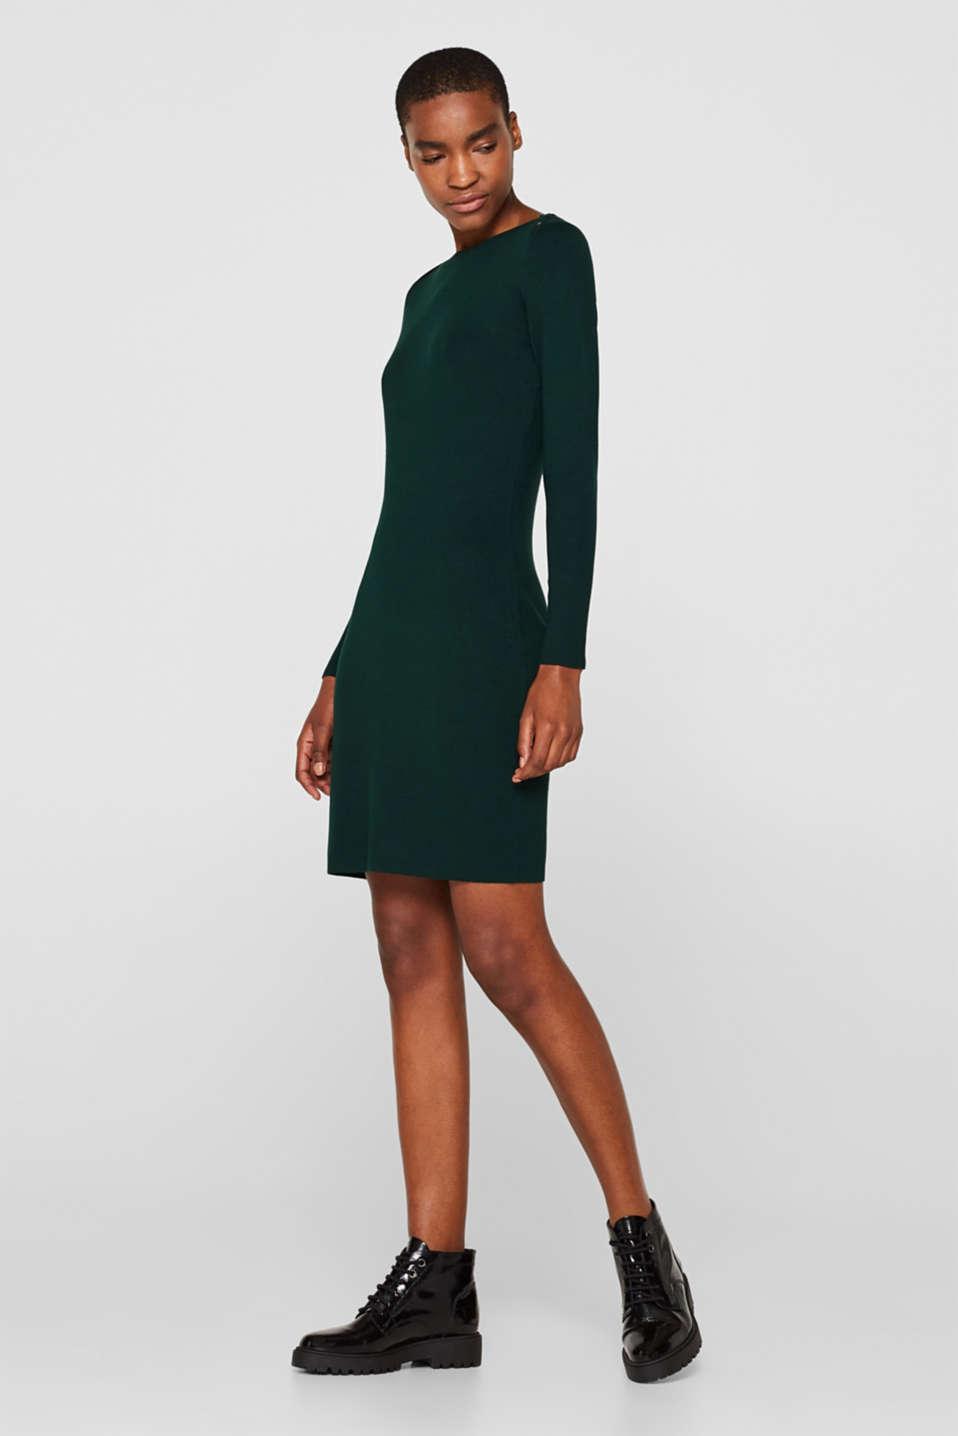 Fine-knit sheath dress, BOTTLE GREEN, detail image number 1